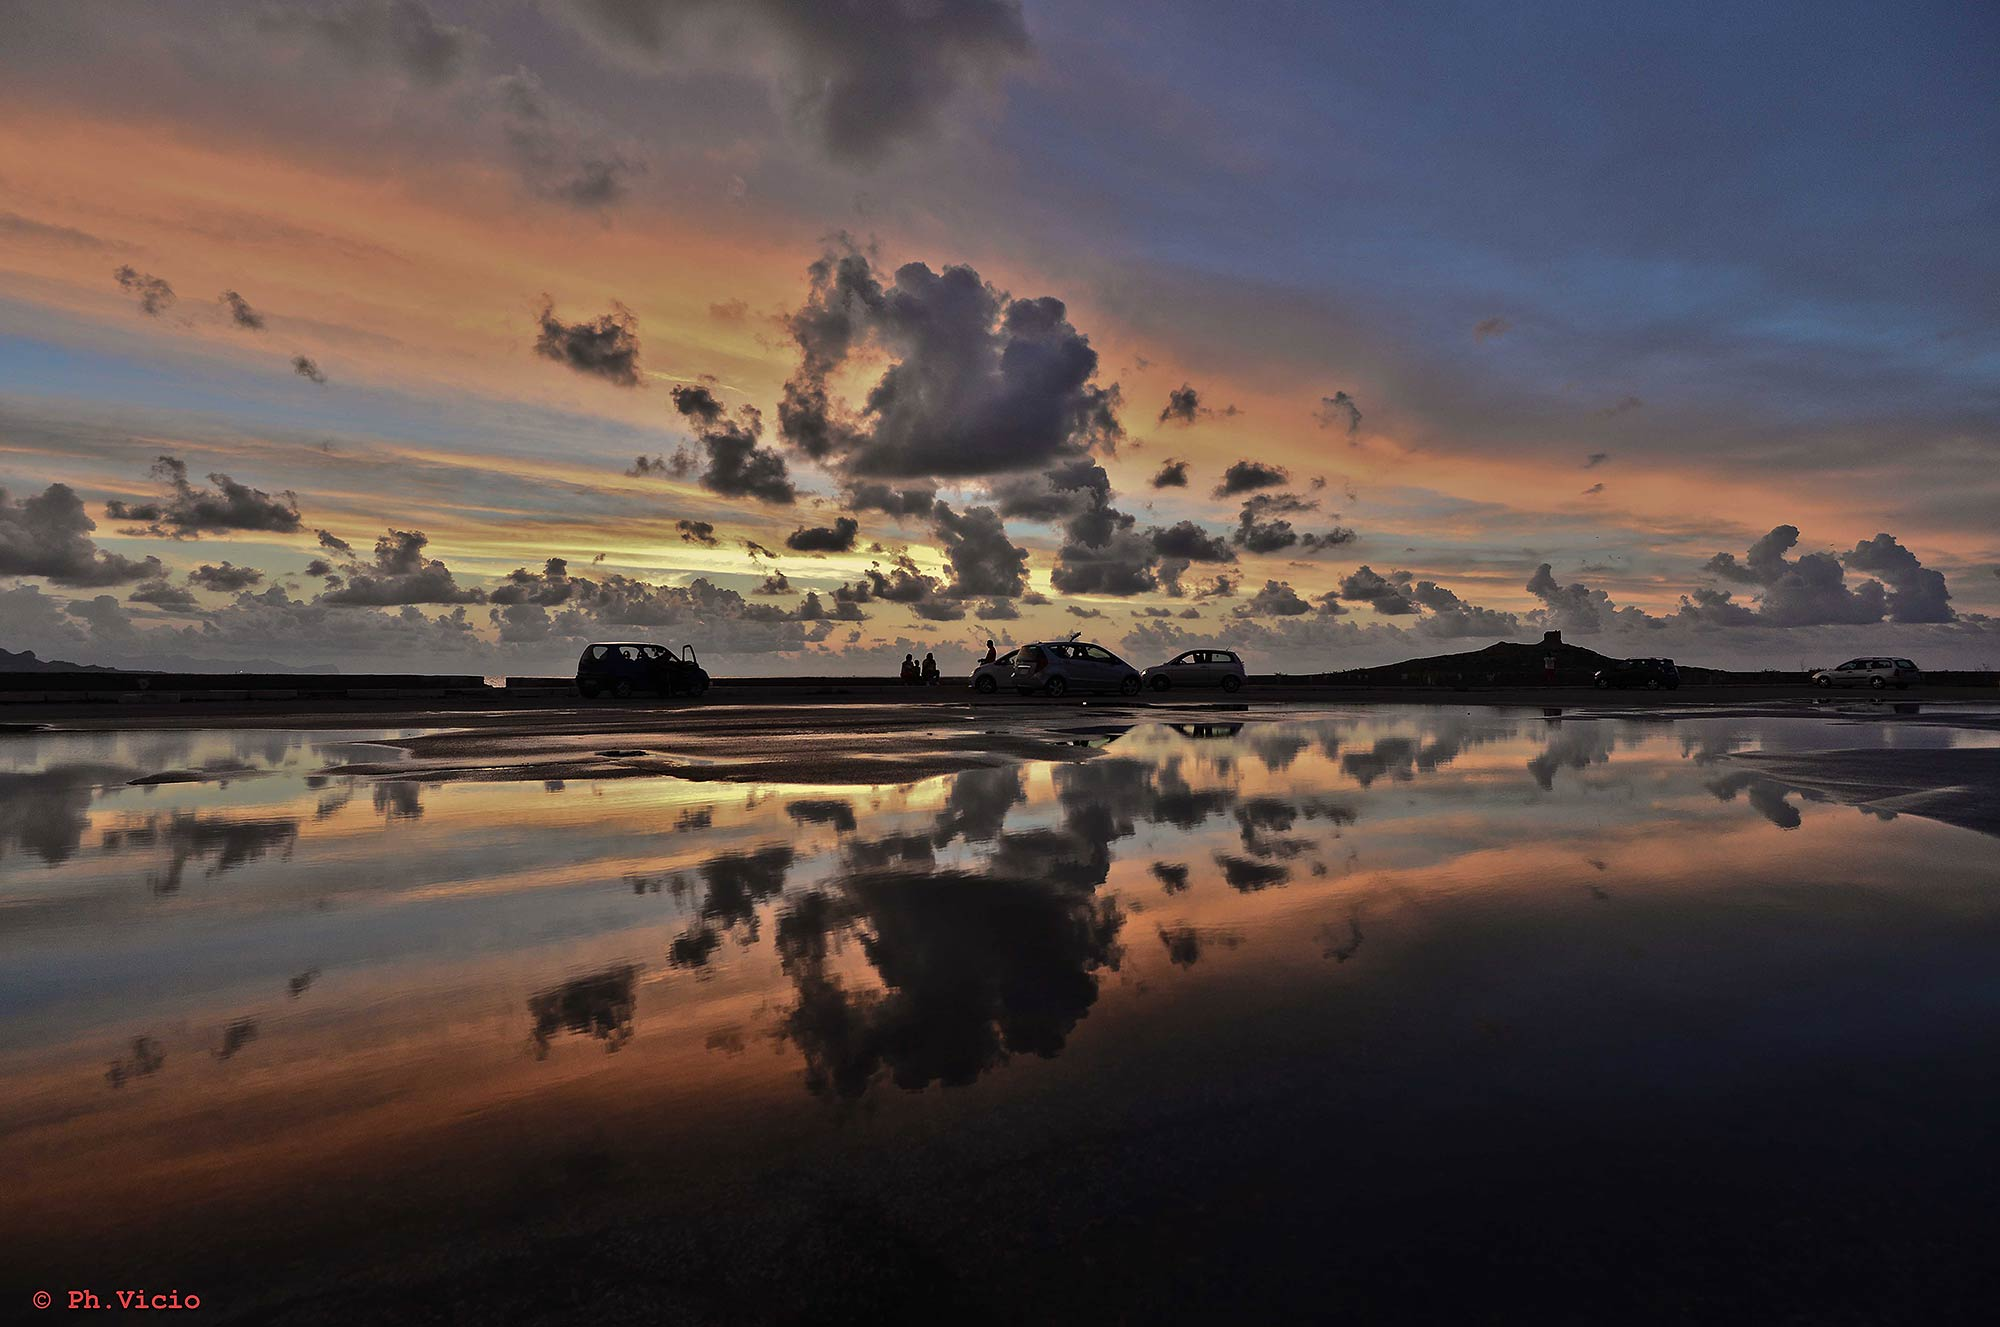 A colored sky near Isola delle femmine